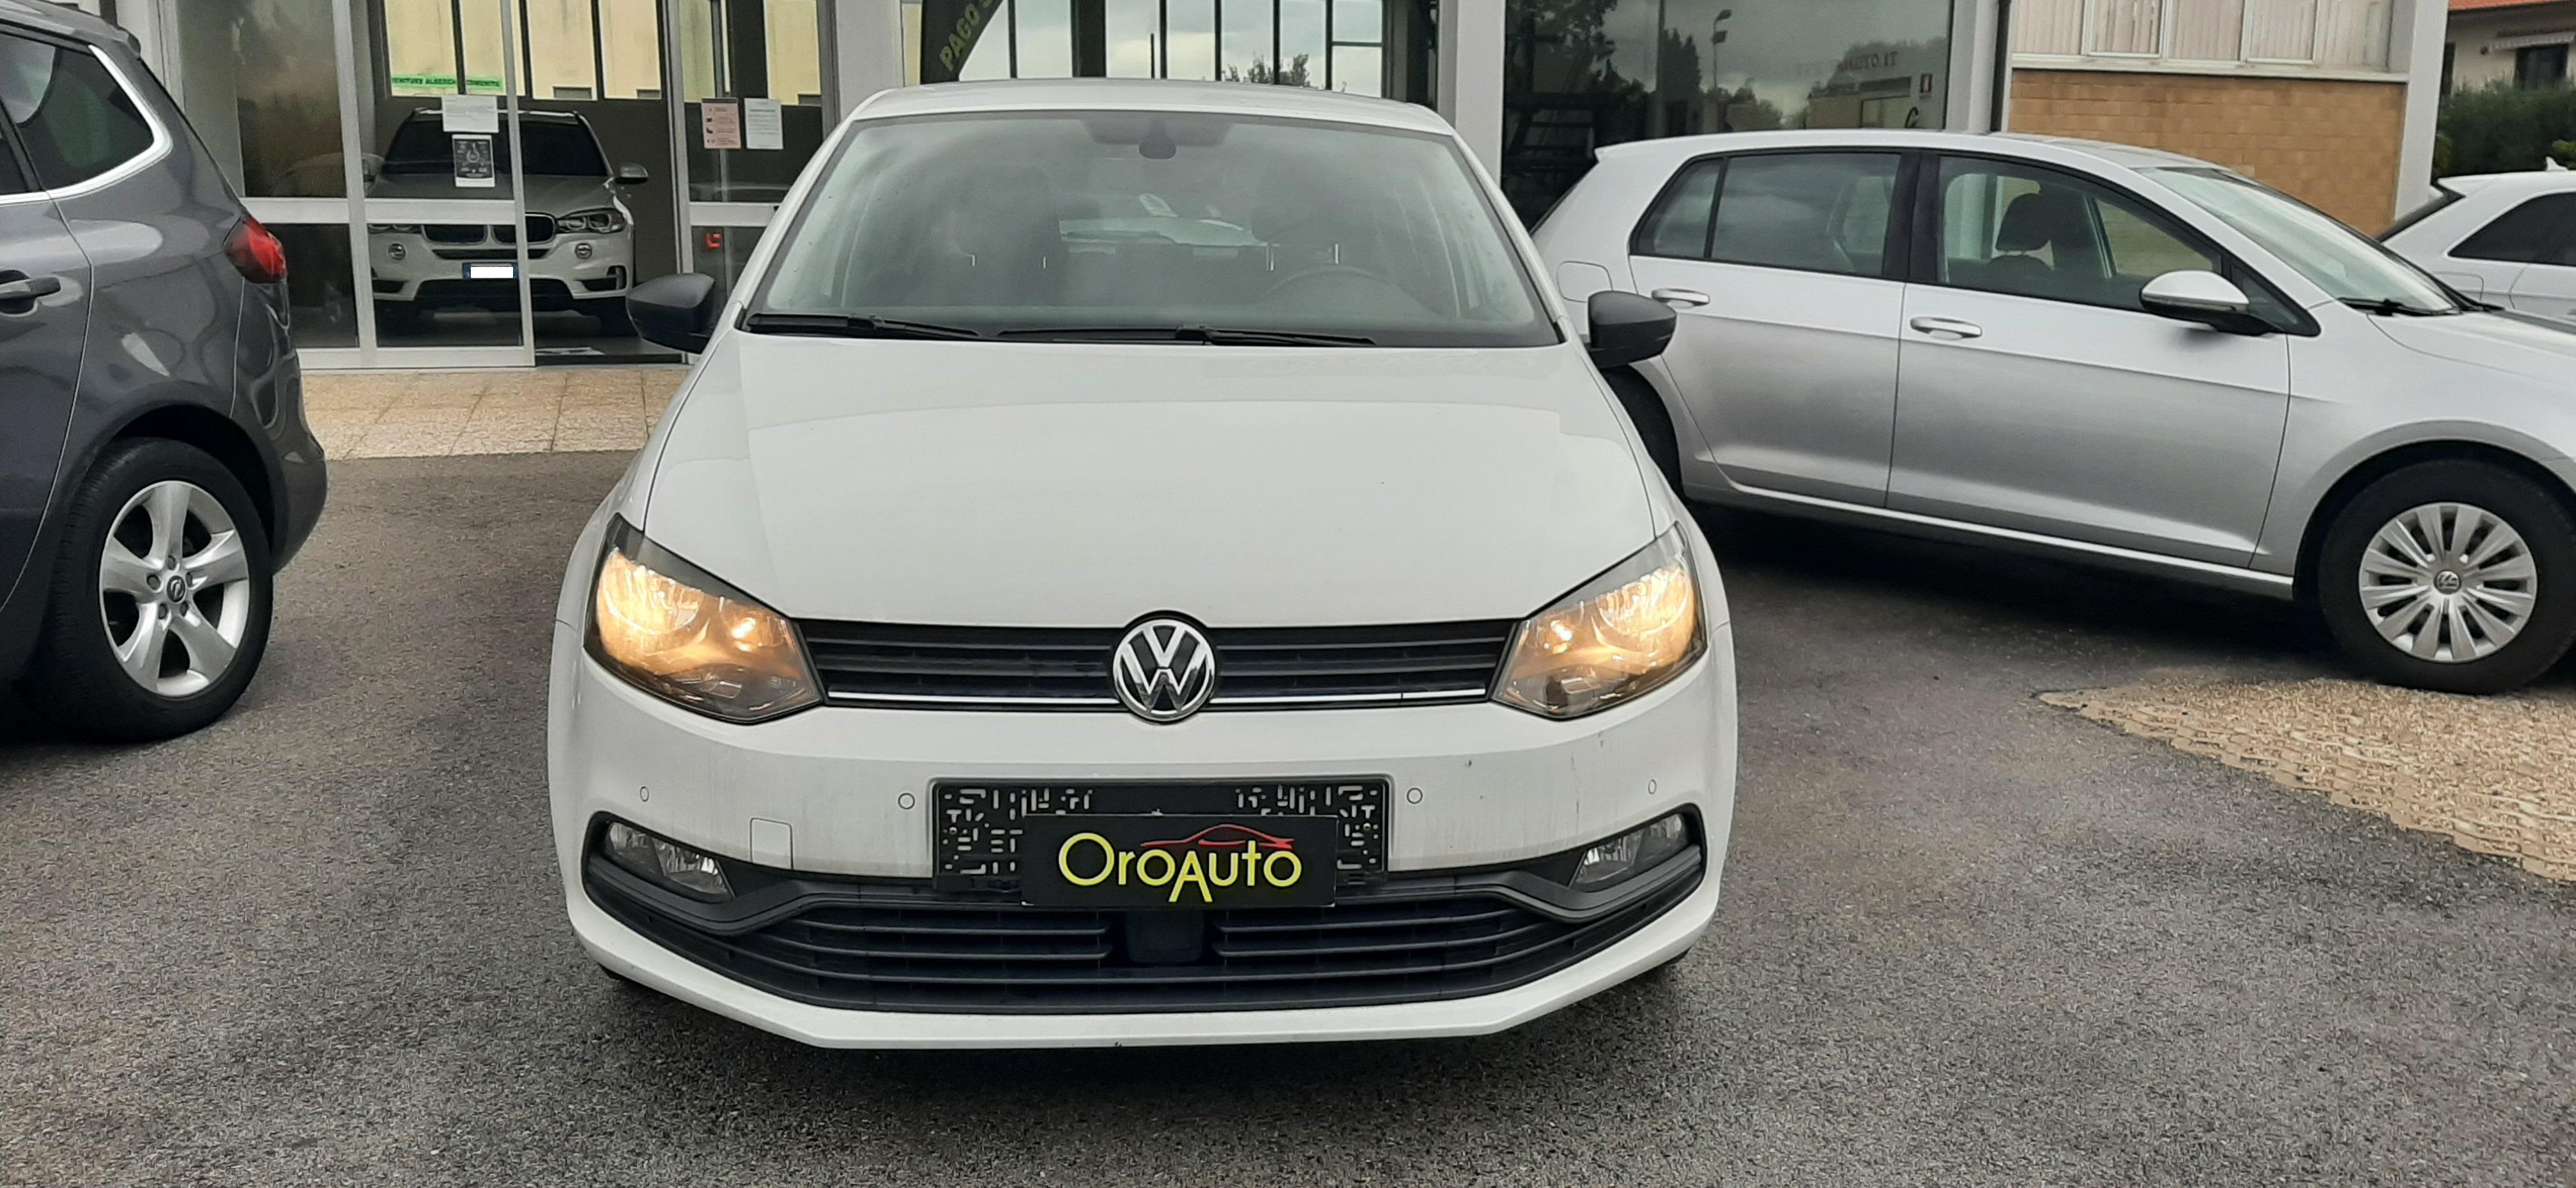 Volkswagen Polo 1.4 TDI 5p-PDC AVANTI E DIETRO-TOUCH-CRUISE-NAVI***VENDUTA***